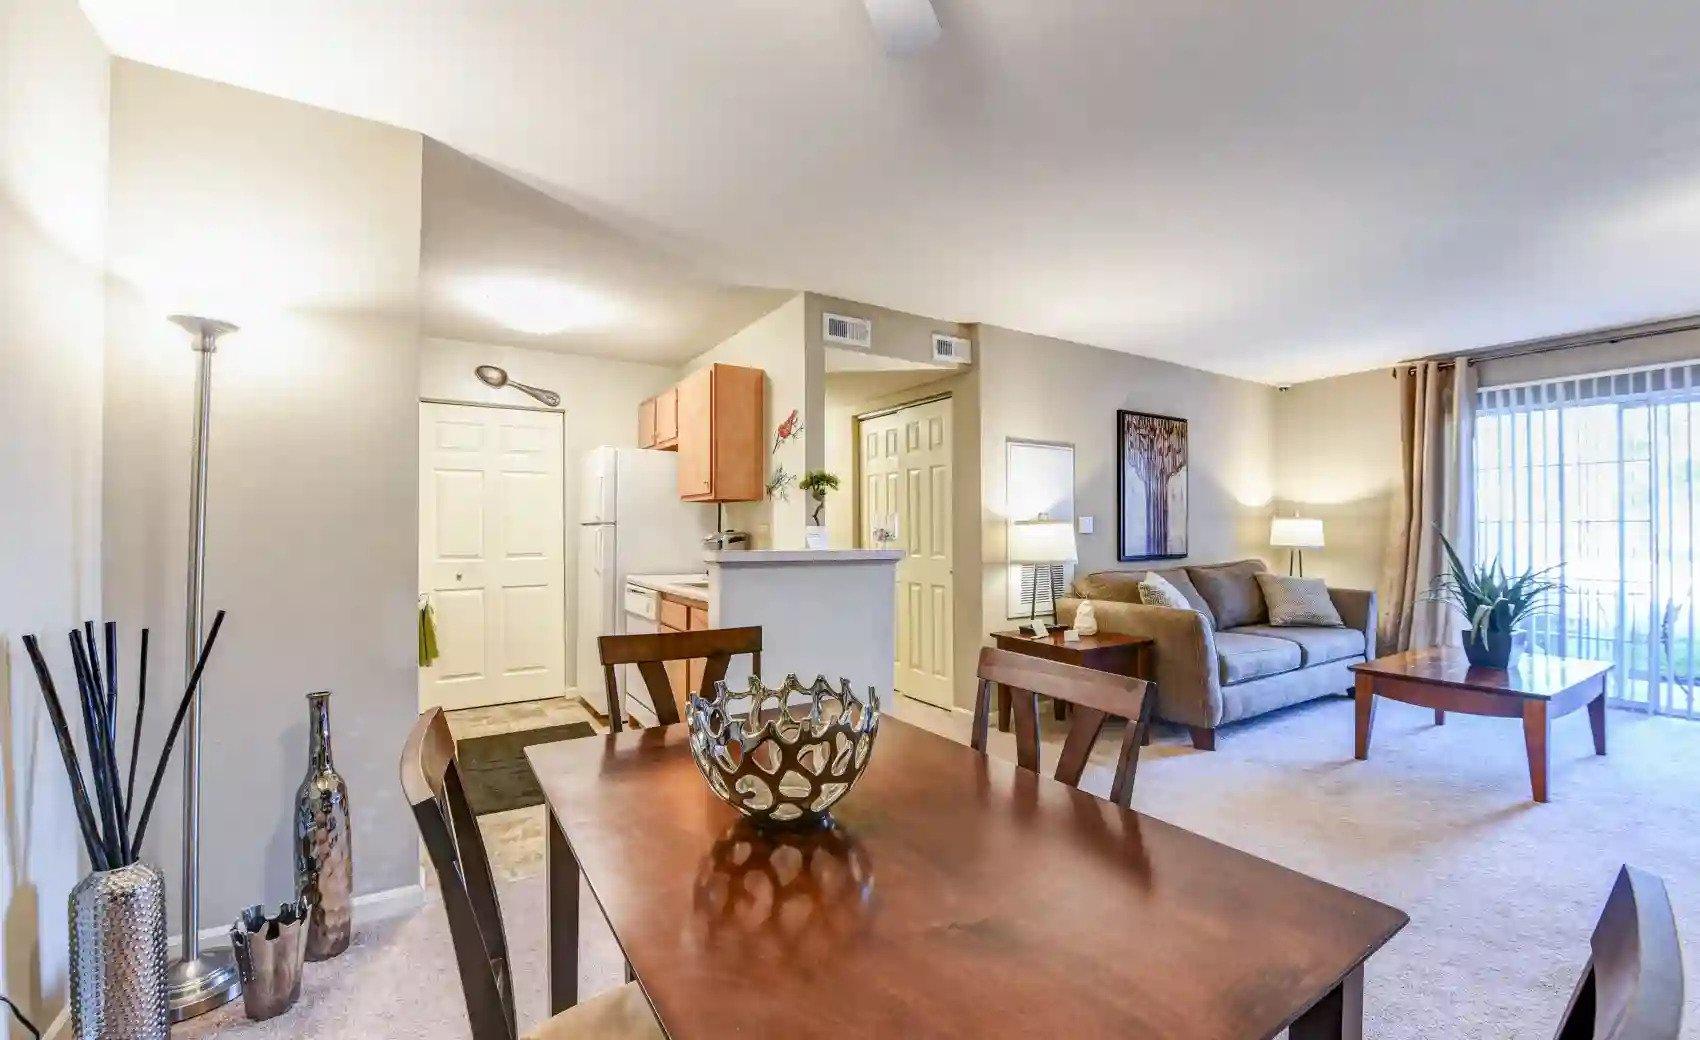 Open Floor Plans at Arbors of Lebanon Apartments in Lebanon, Ohio